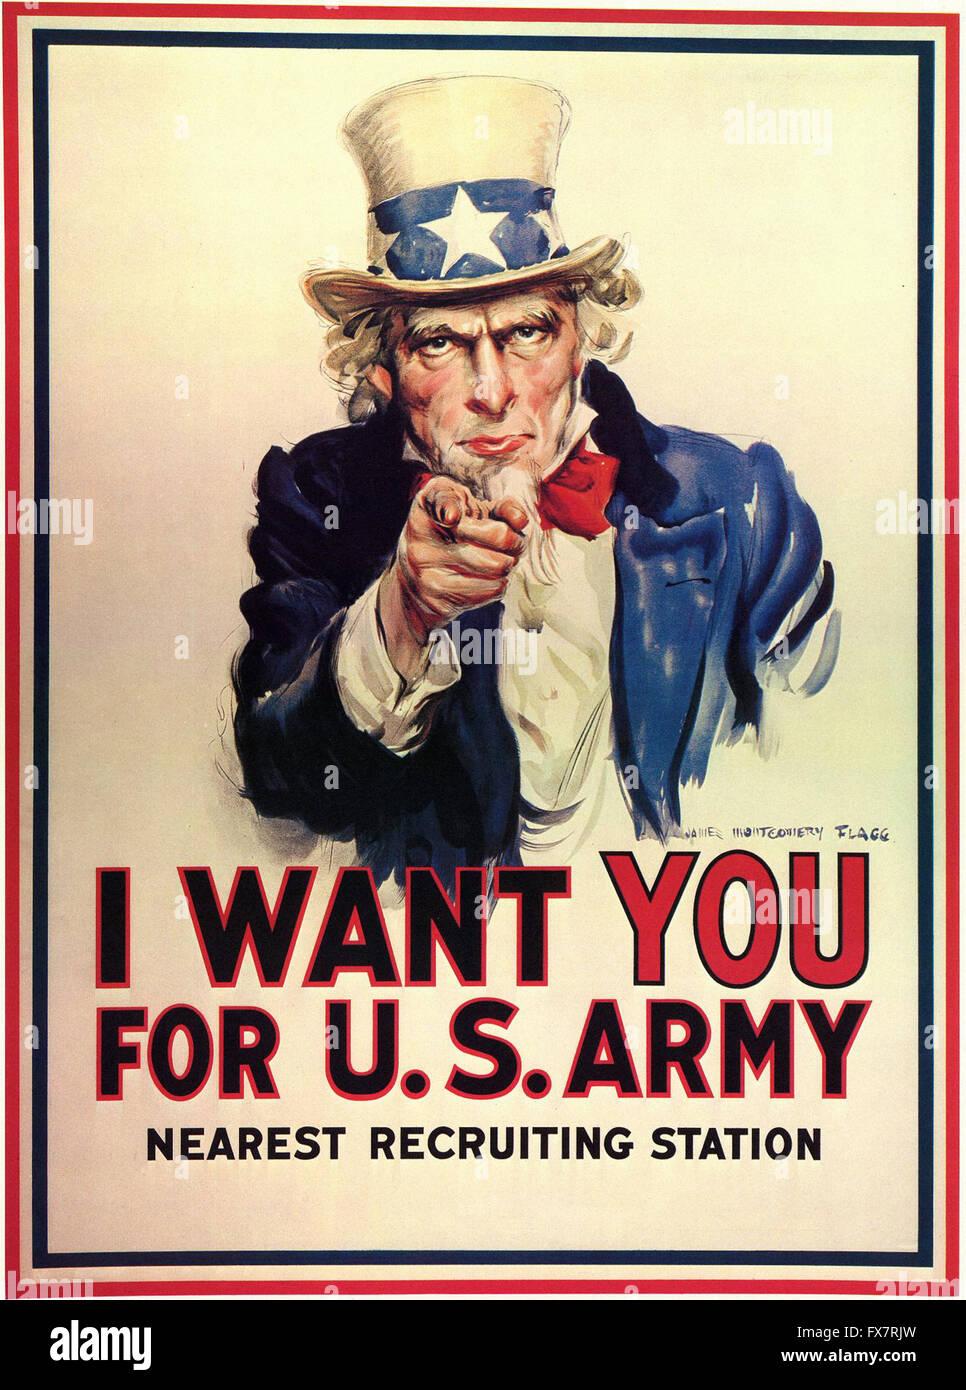 Uncle Sam - I Want You For U.S. Army - World War II - U.S propaganda Poster - Stock Image